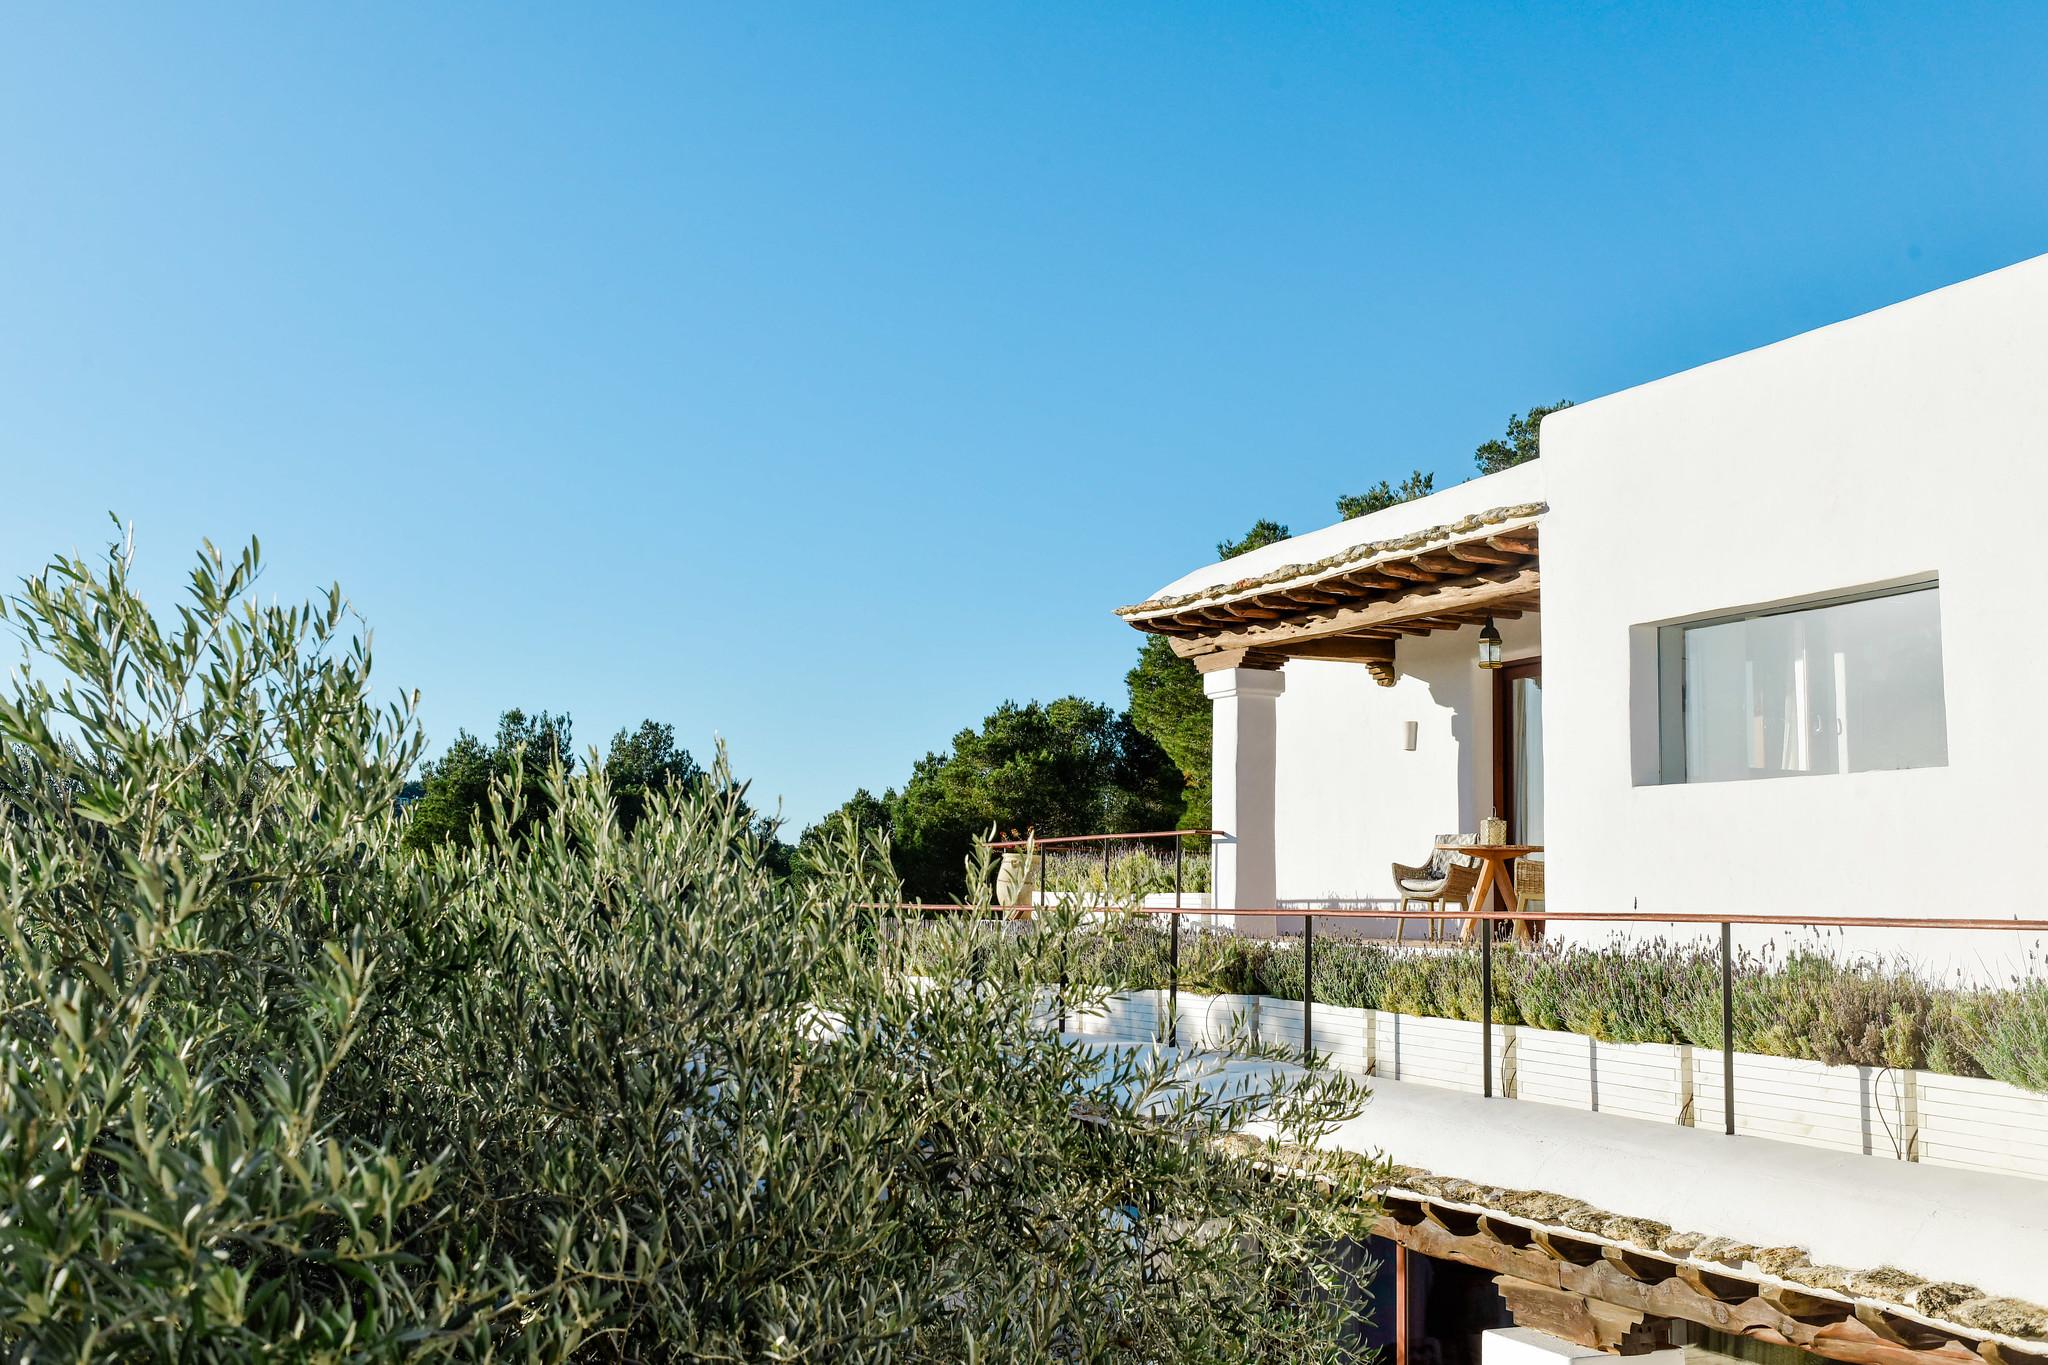 https://www.white-ibiza.com/wp-content/uploads/2020/05/white-ibiza-villas-can-lavanda-terrace.jpg